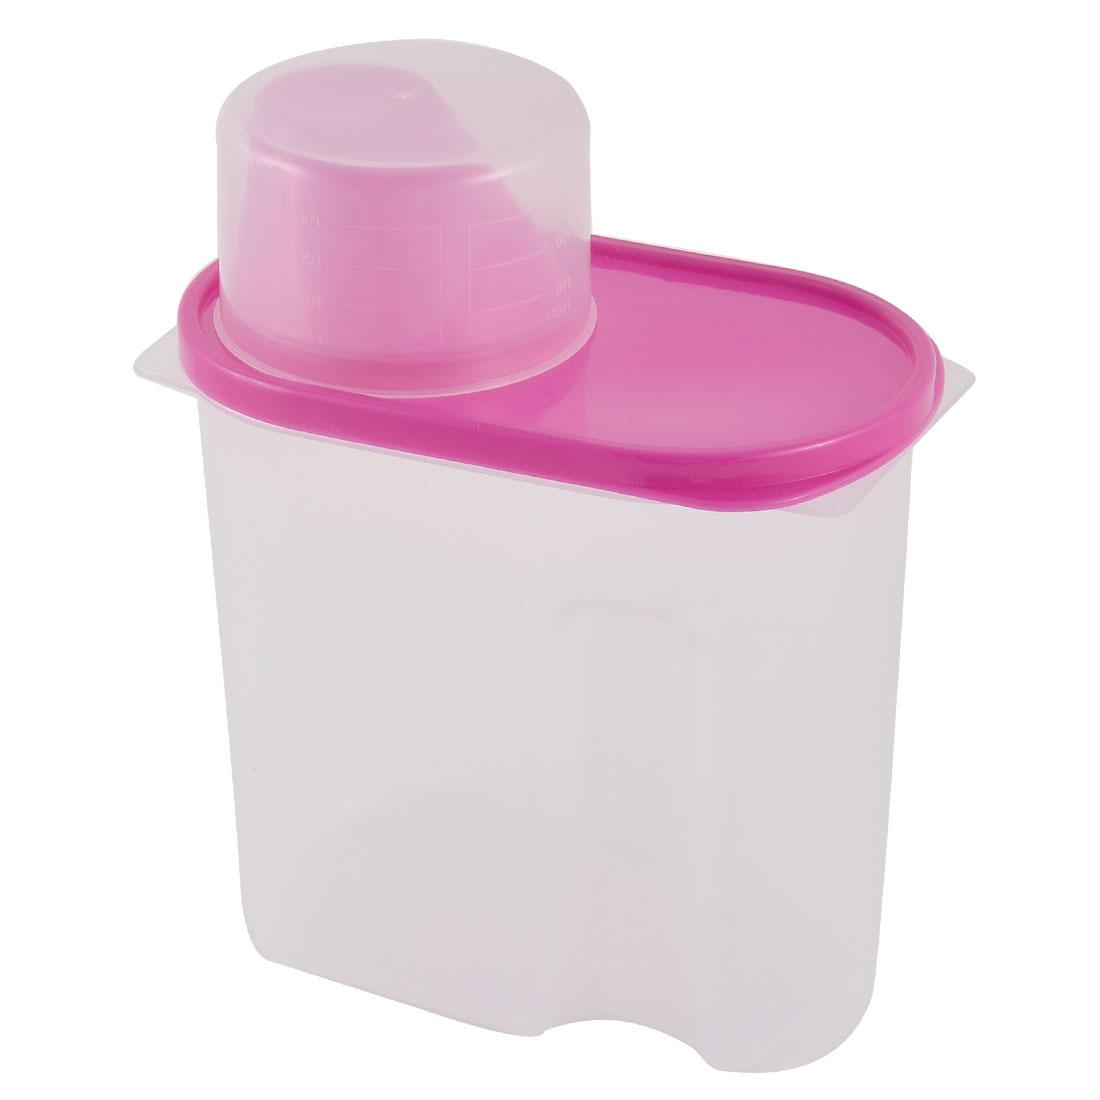 Household Kitchenware Plastic Food Storage Box Airtight Seal Holder Fuchsia